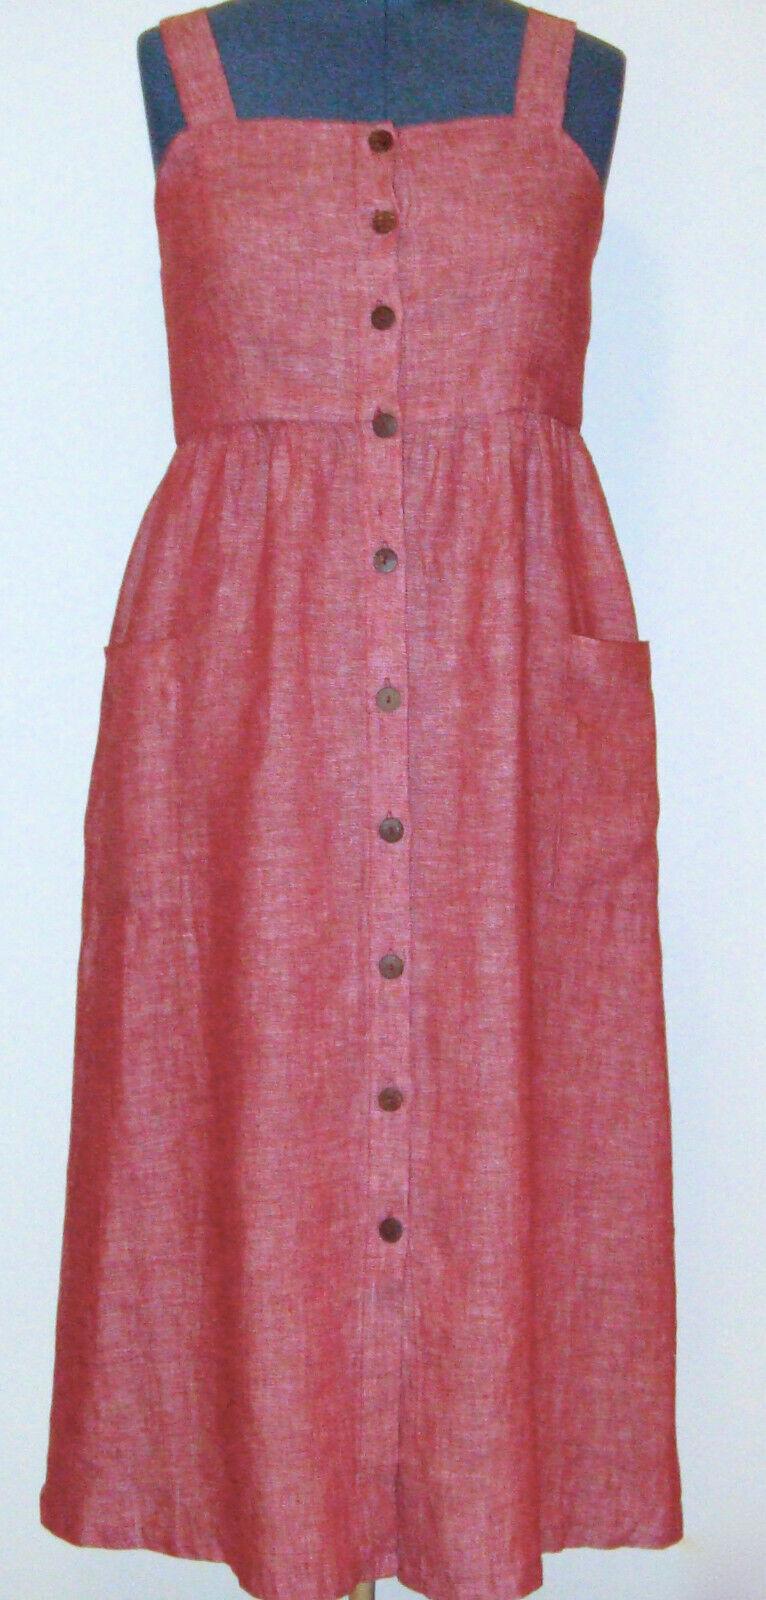 Rachel Zoe Women's Linen Dress Size M Dark Red Midi New